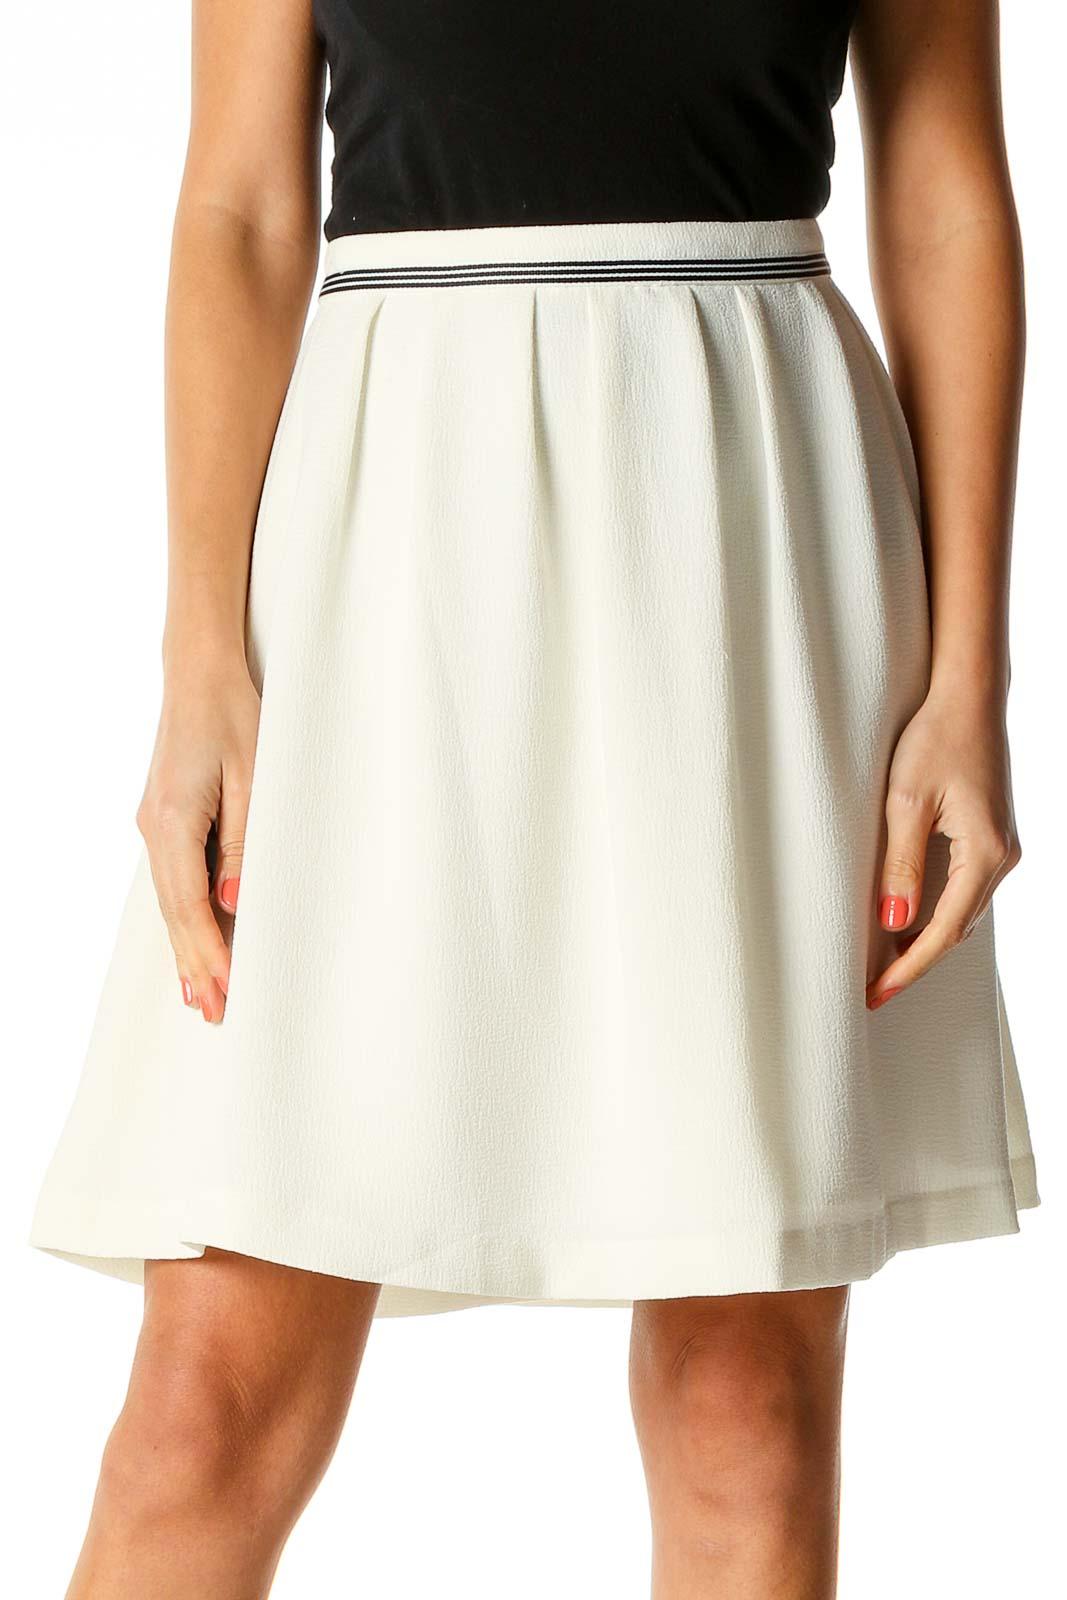 White Chic Flared Skirt Front